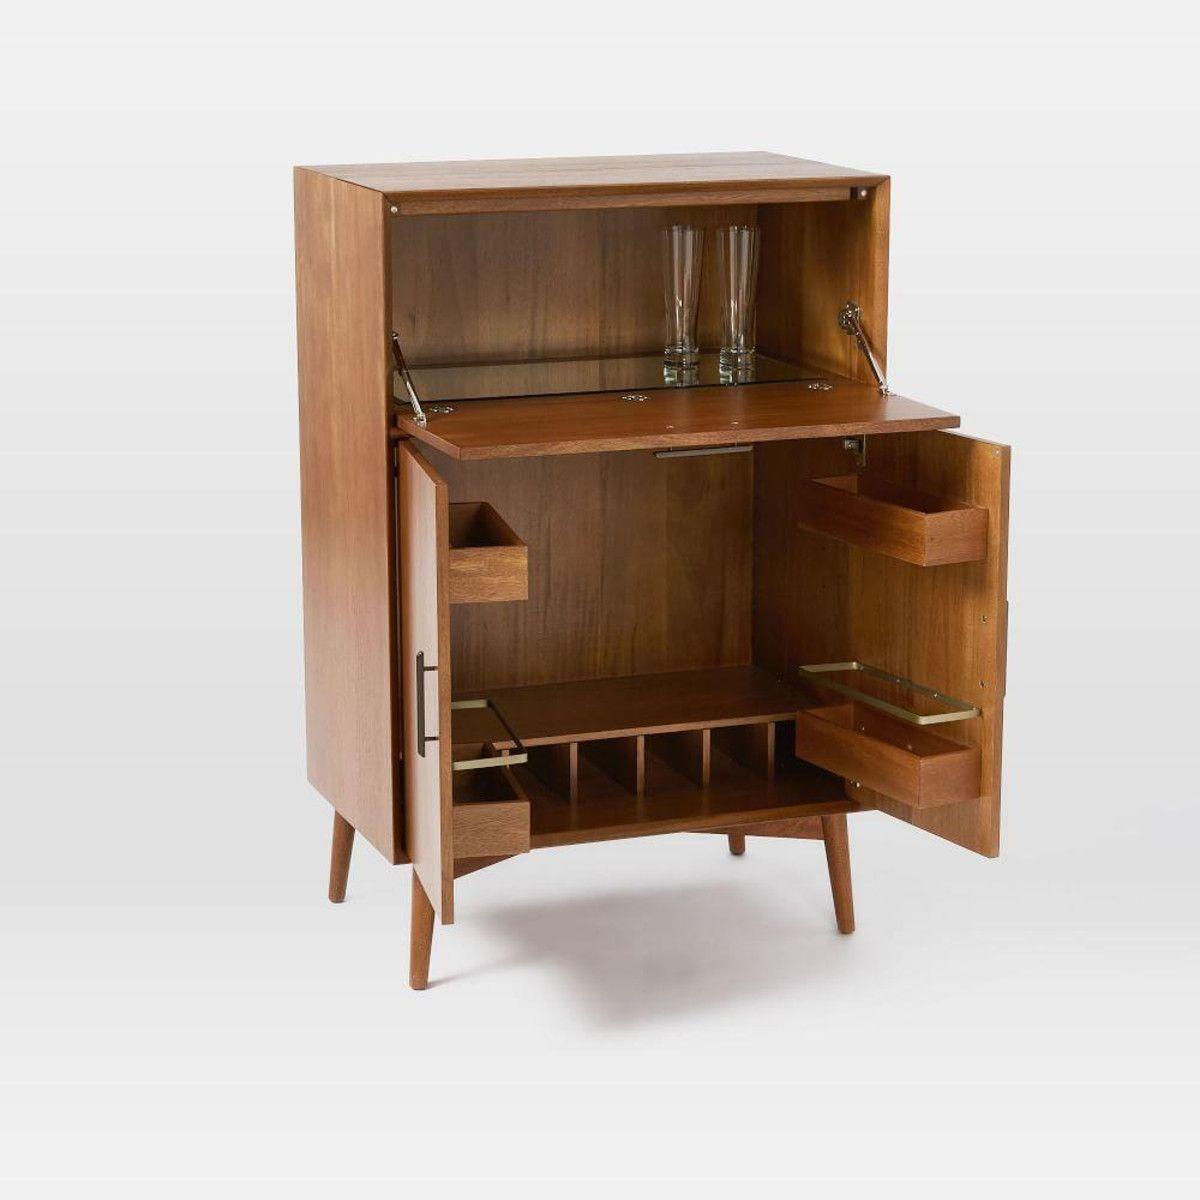 mid century bar cabinet Mid Century Bar Cabi  Large | Furniture gallery | Pinterest  mid century bar cabinet